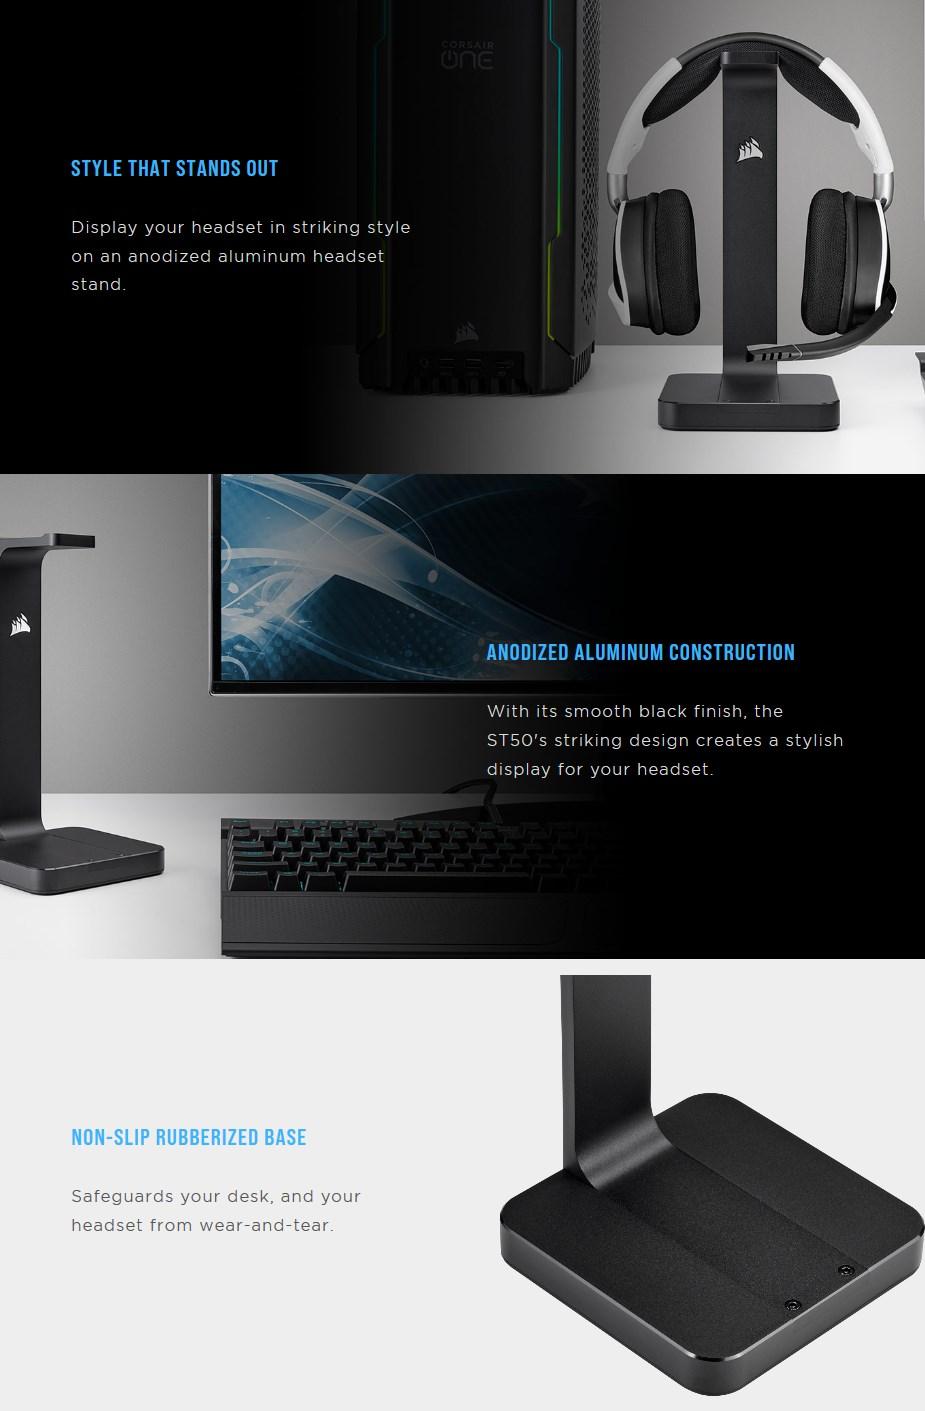 corsair-st50-premium-headset-stand-holder-ac30061-6.jpg